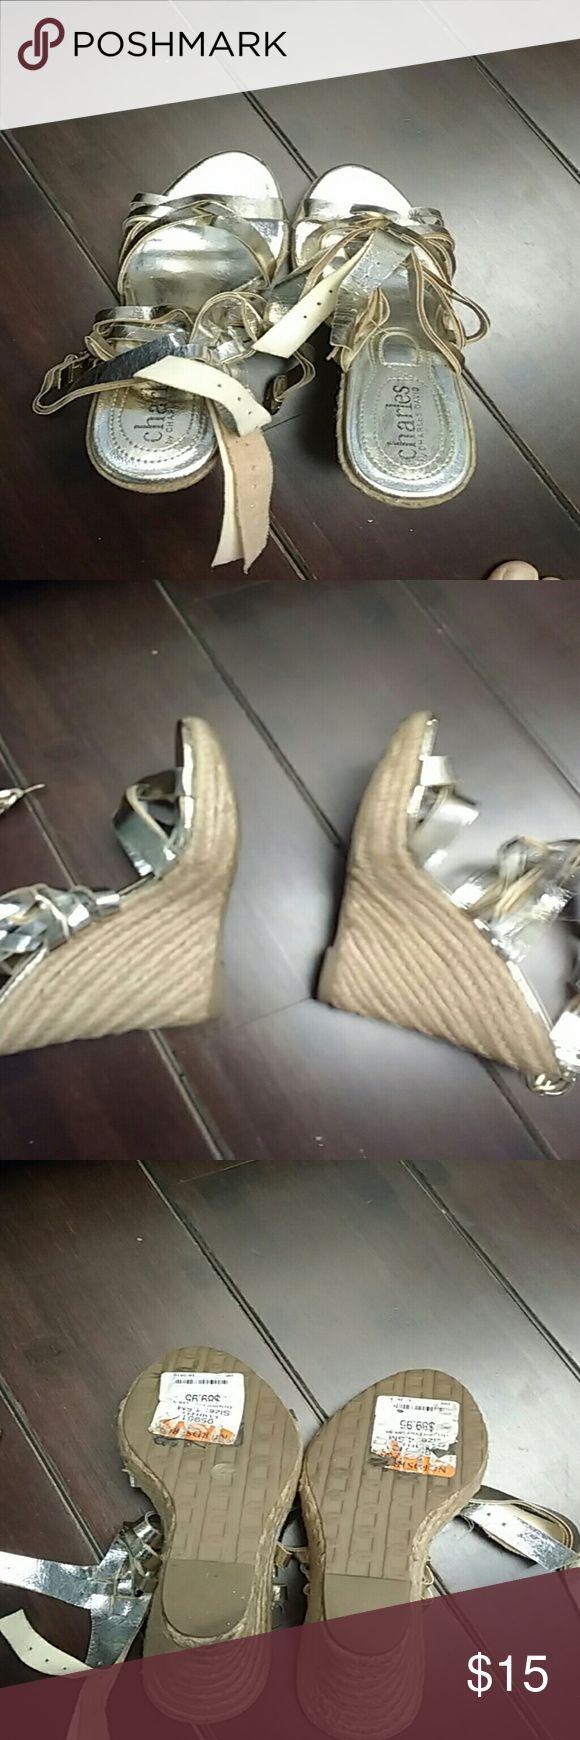 Charles David Shoes Like new Charles David Shoes Wedges